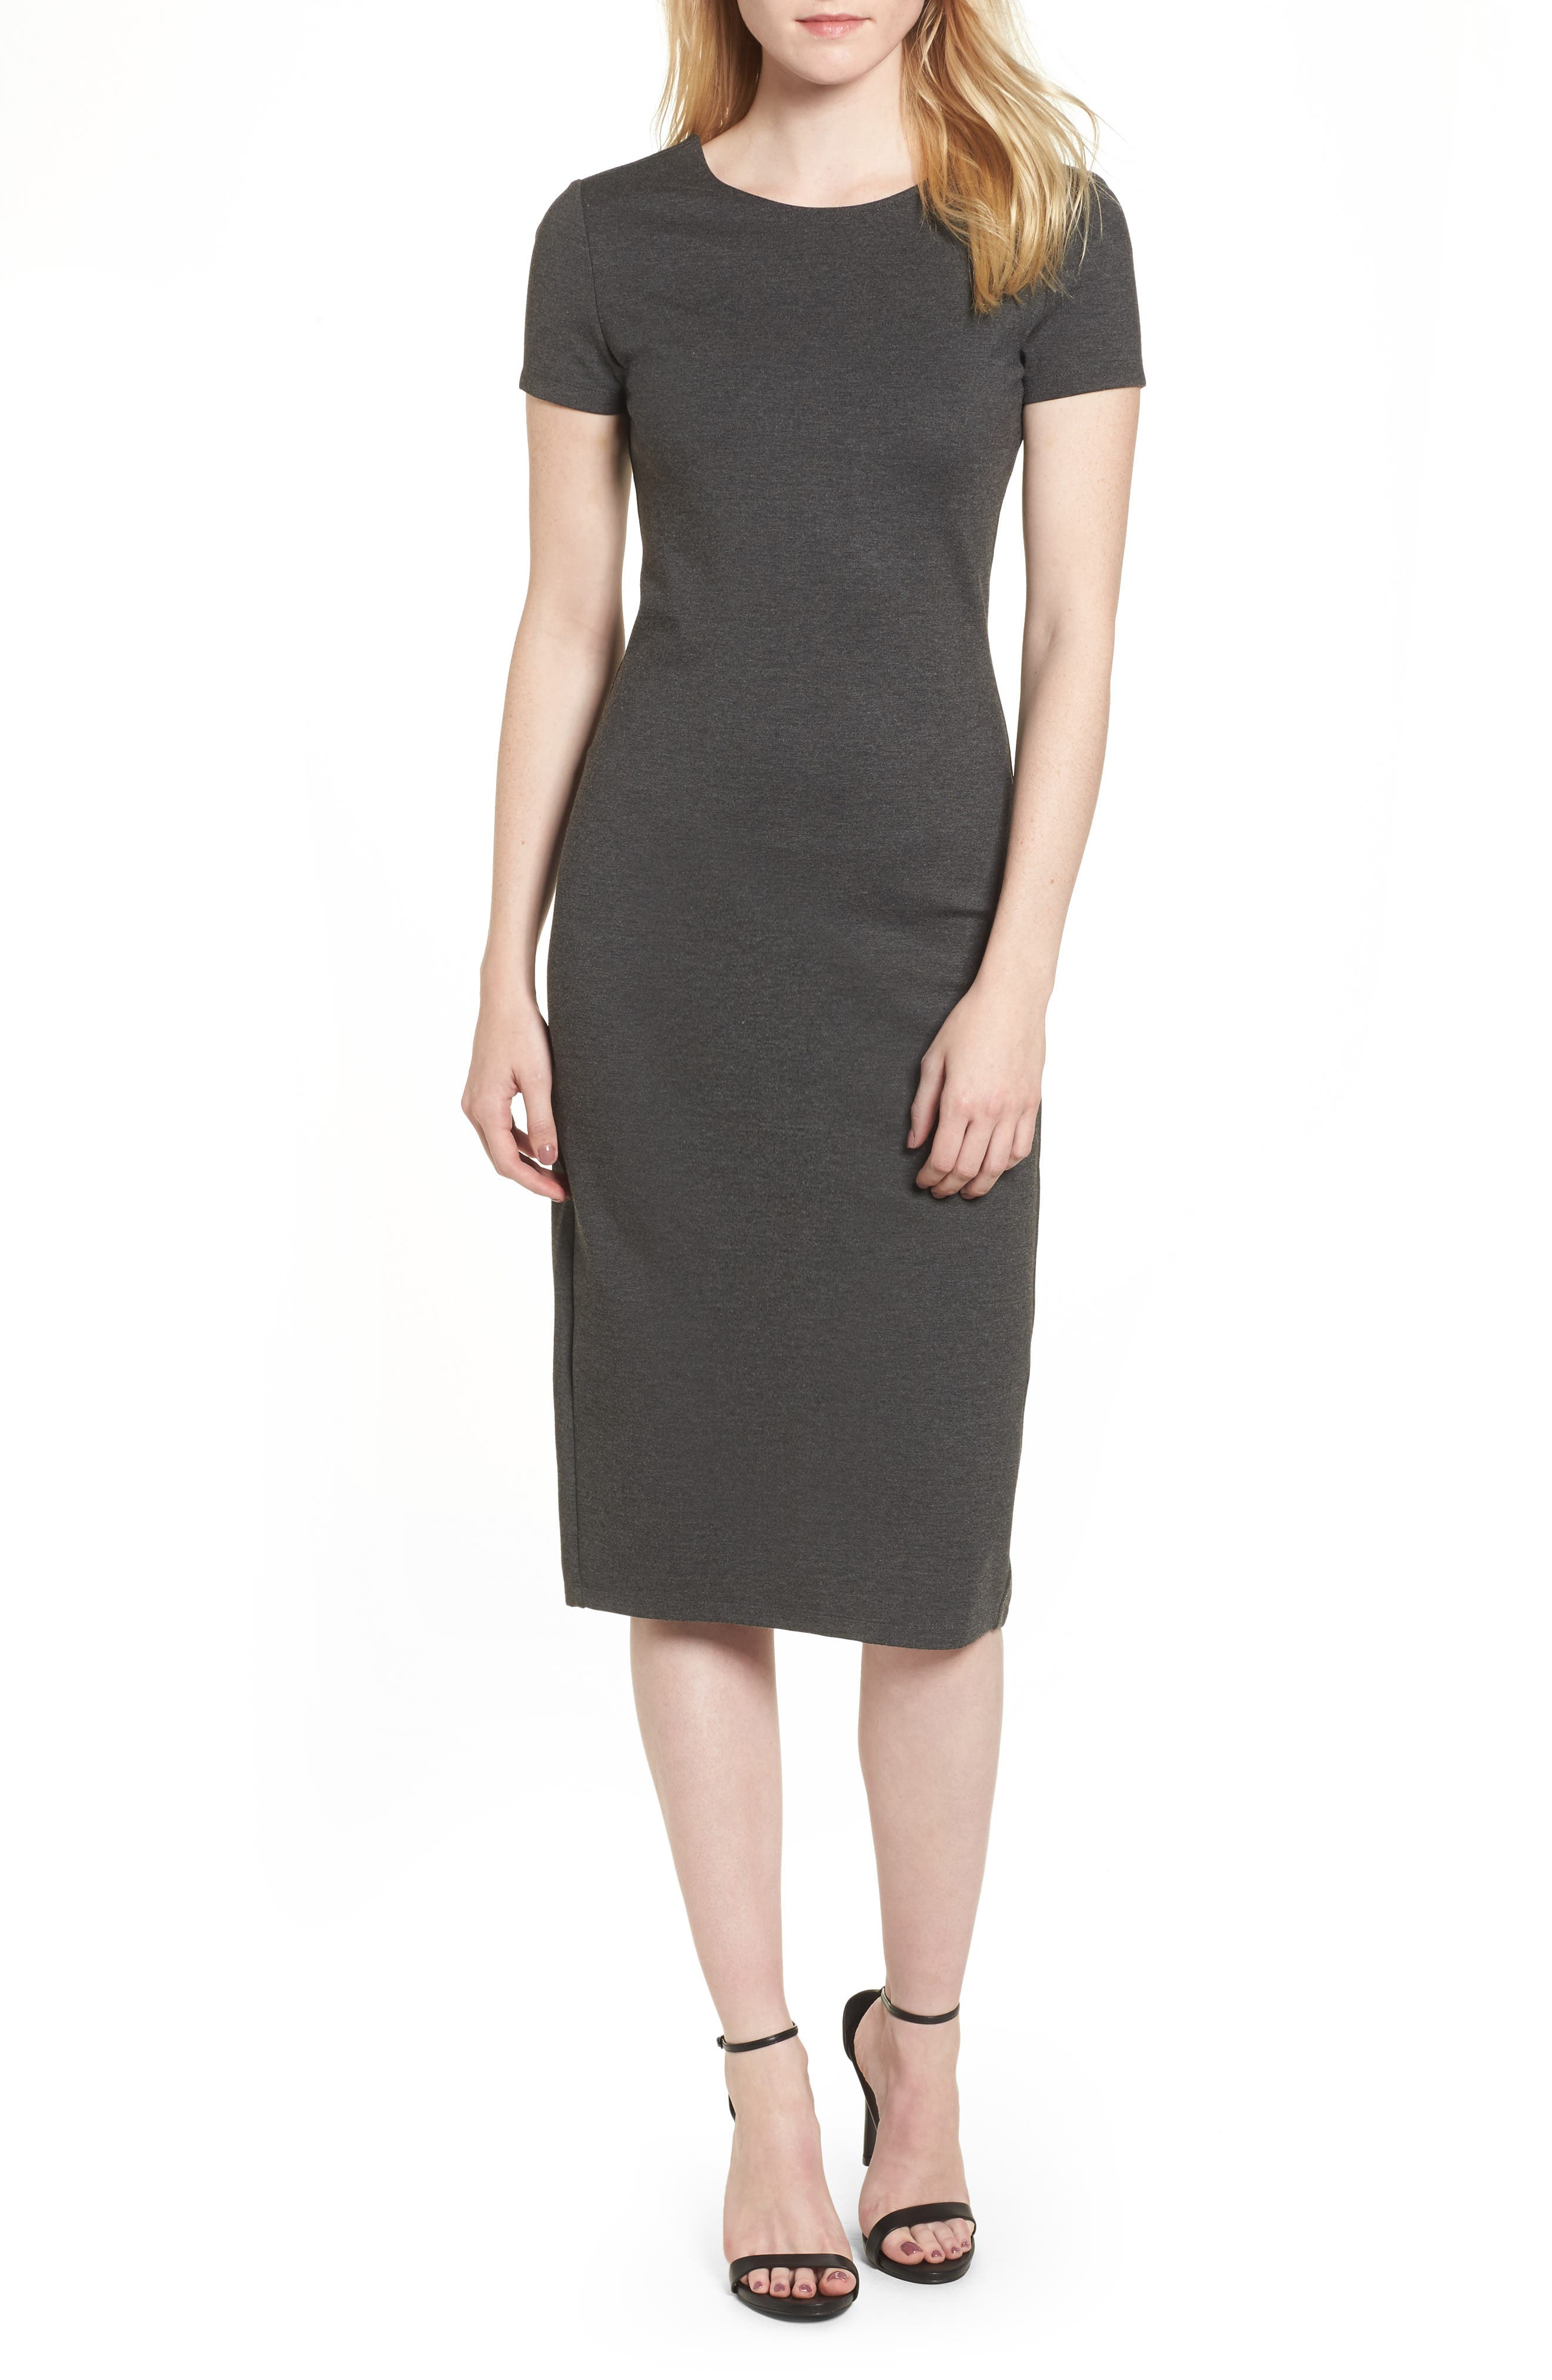 Sentimental Ny Ponte Sheath Dress, Grey